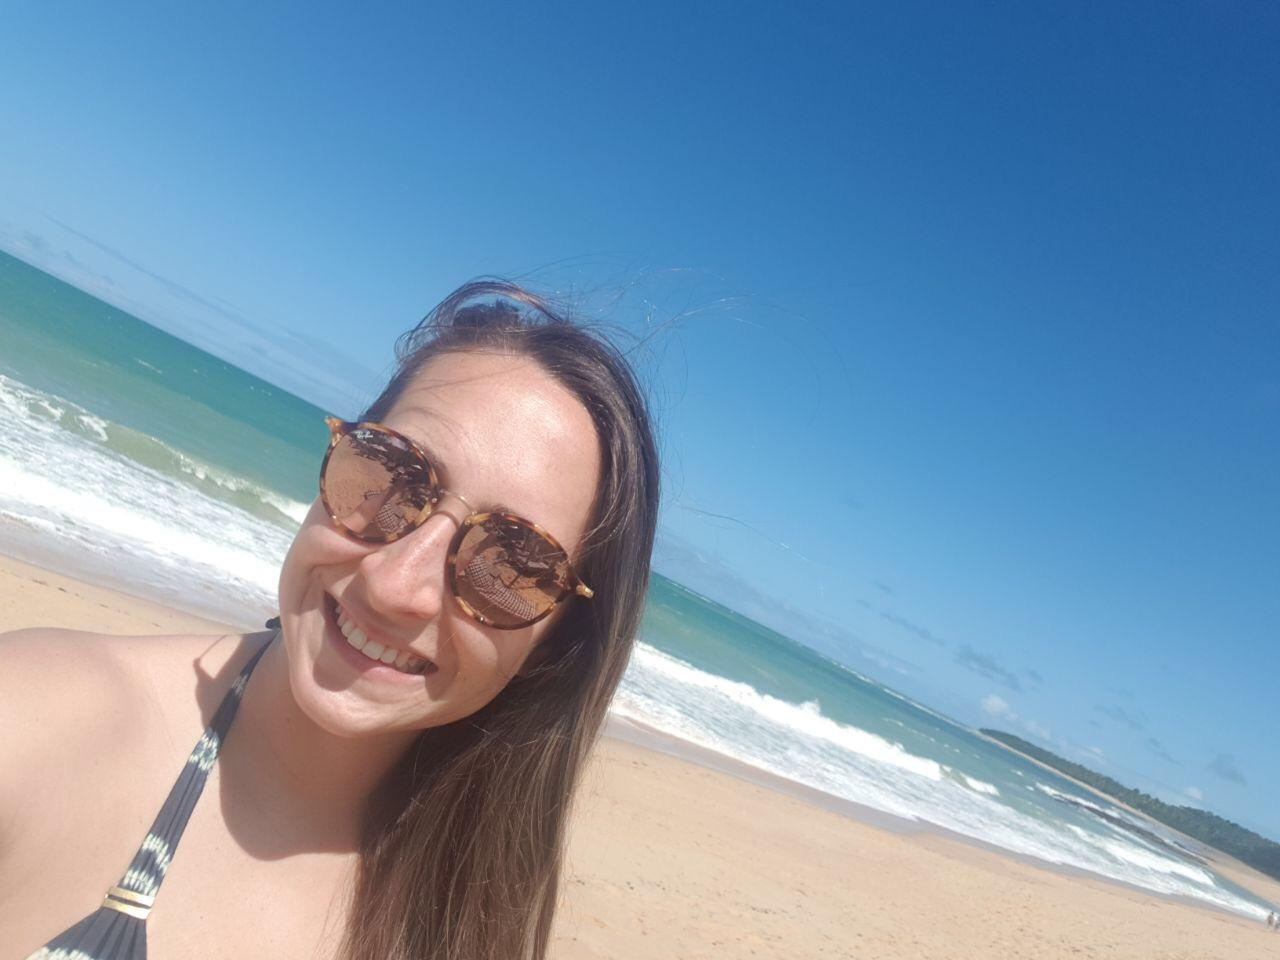 isabelle na praia rio verde em trancoso